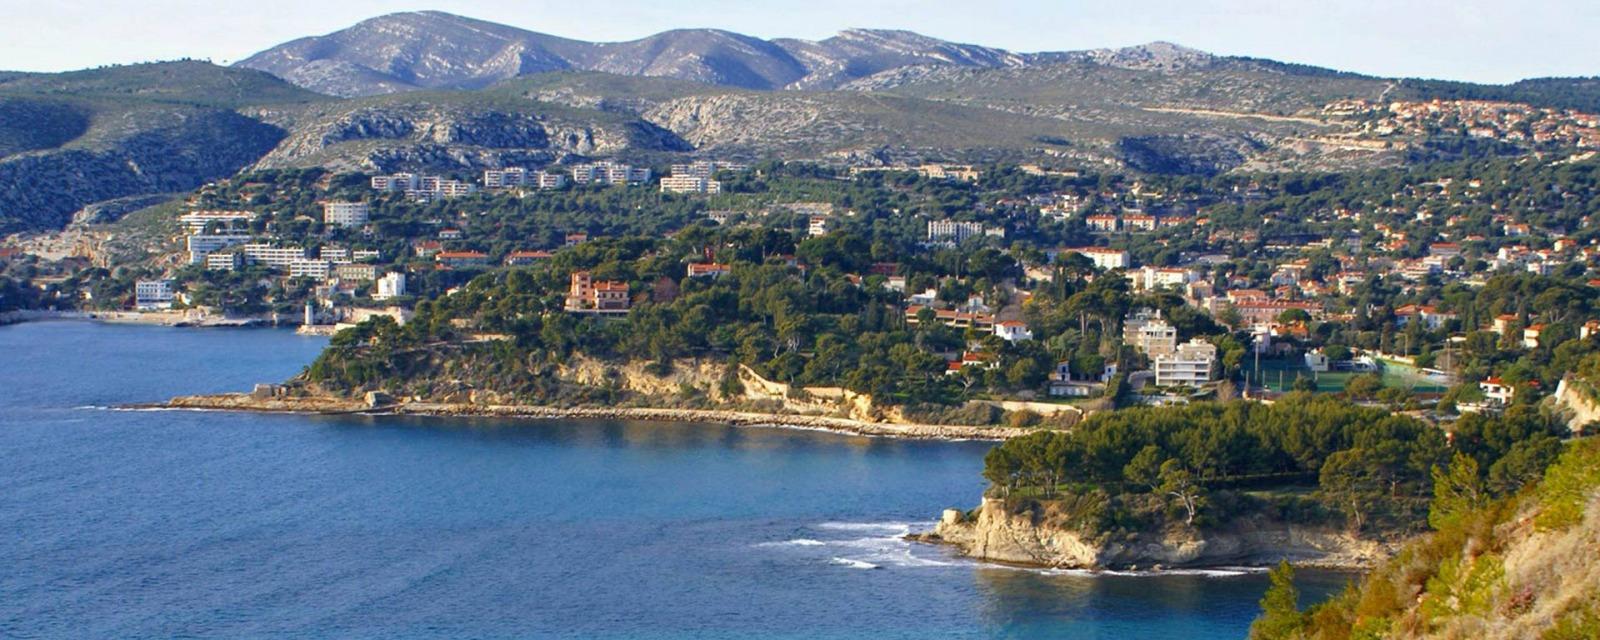 societe anti cafards carnoux en provence